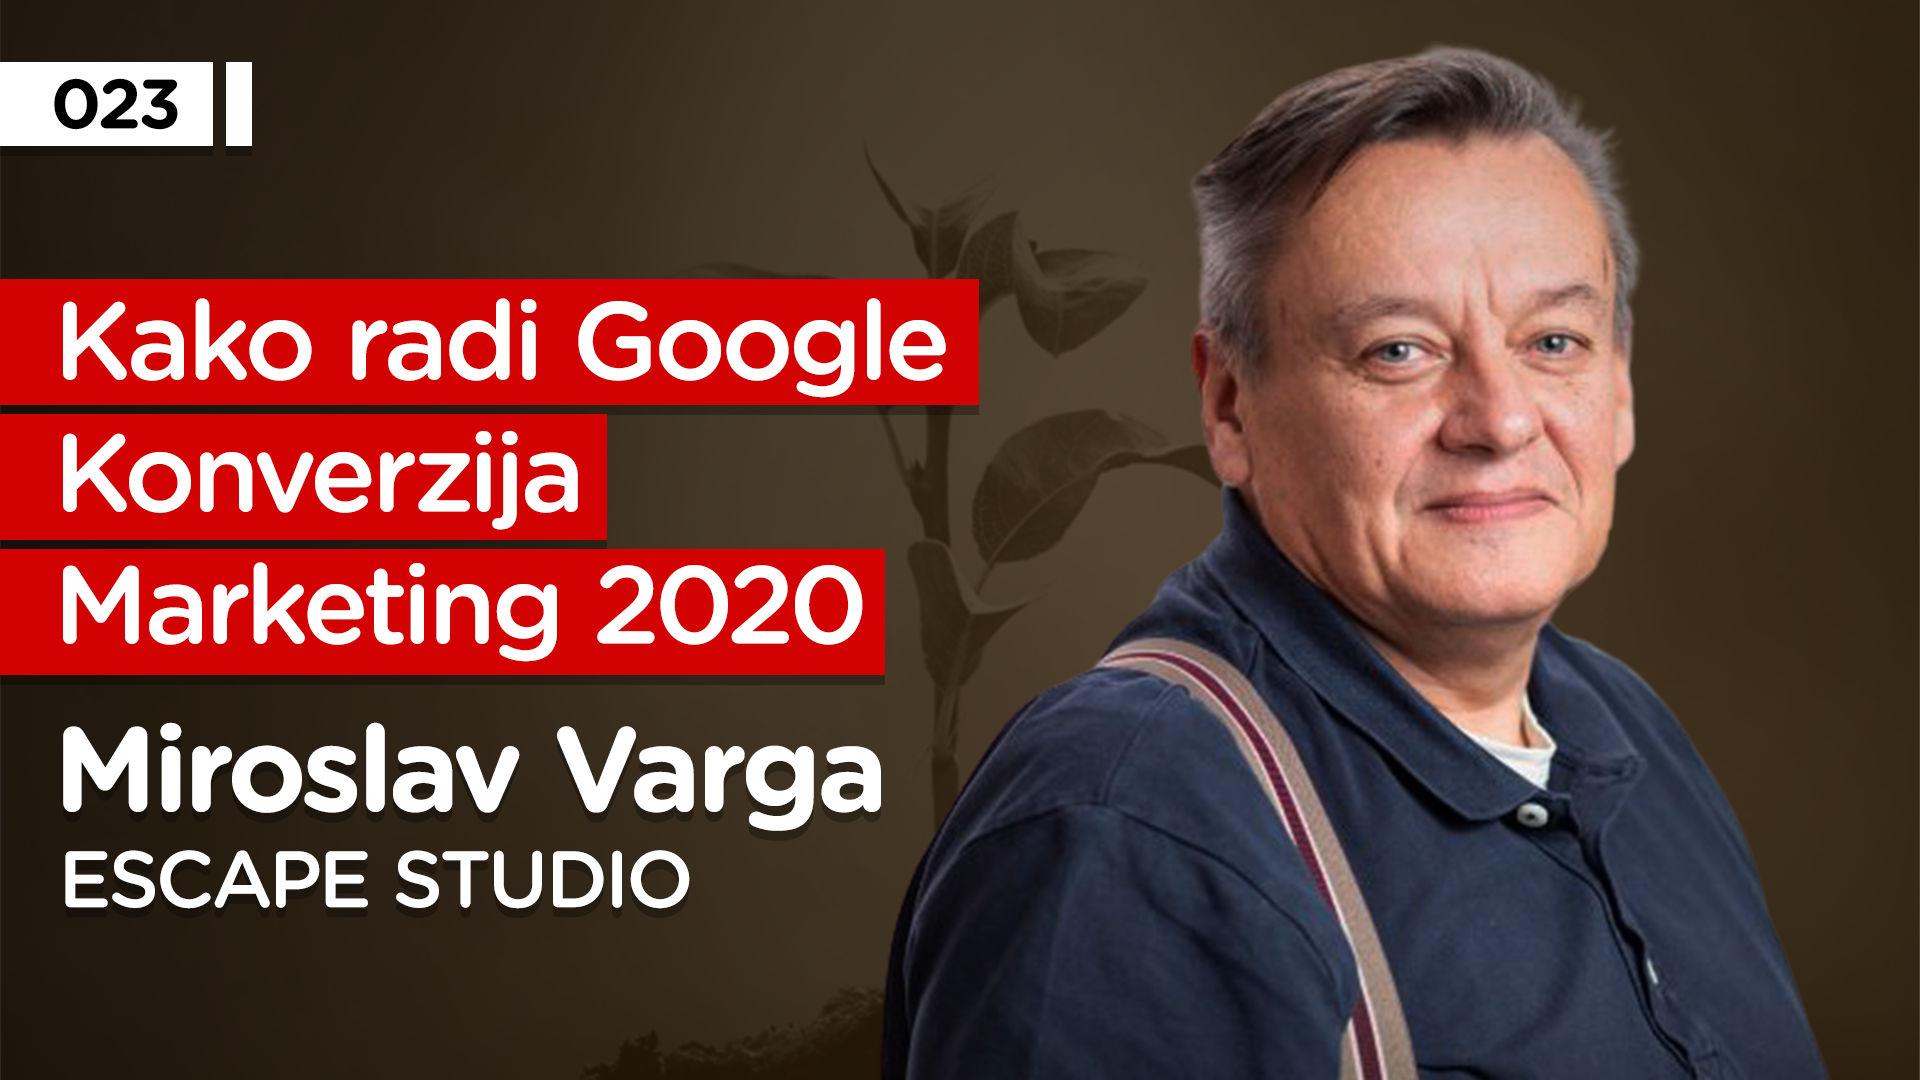 EP023: Miroslav Varga